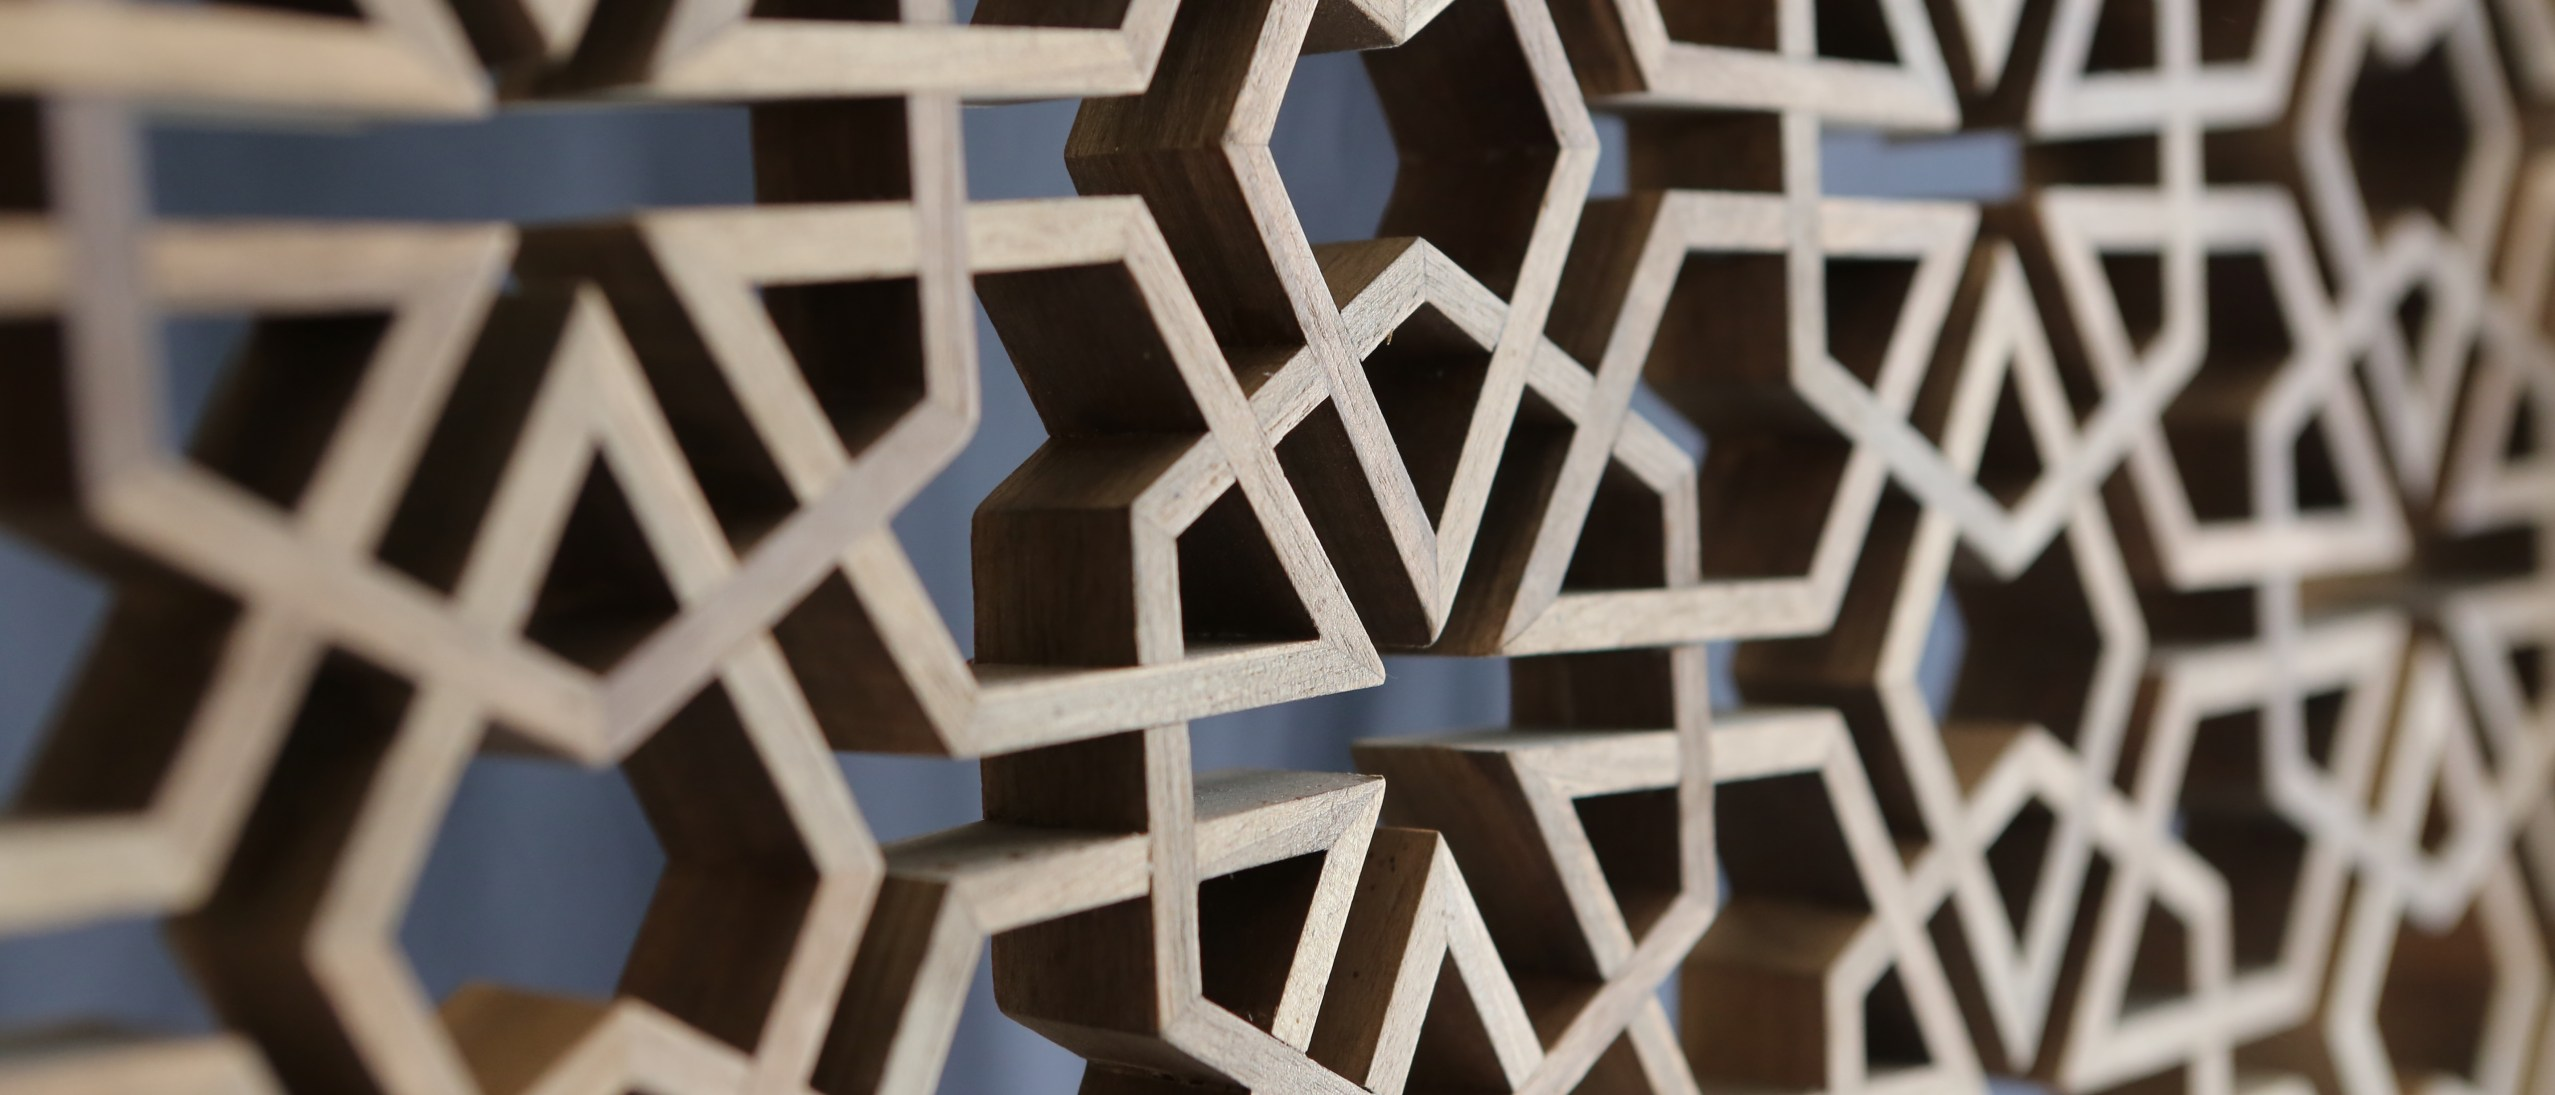 Intricate wooden latticework